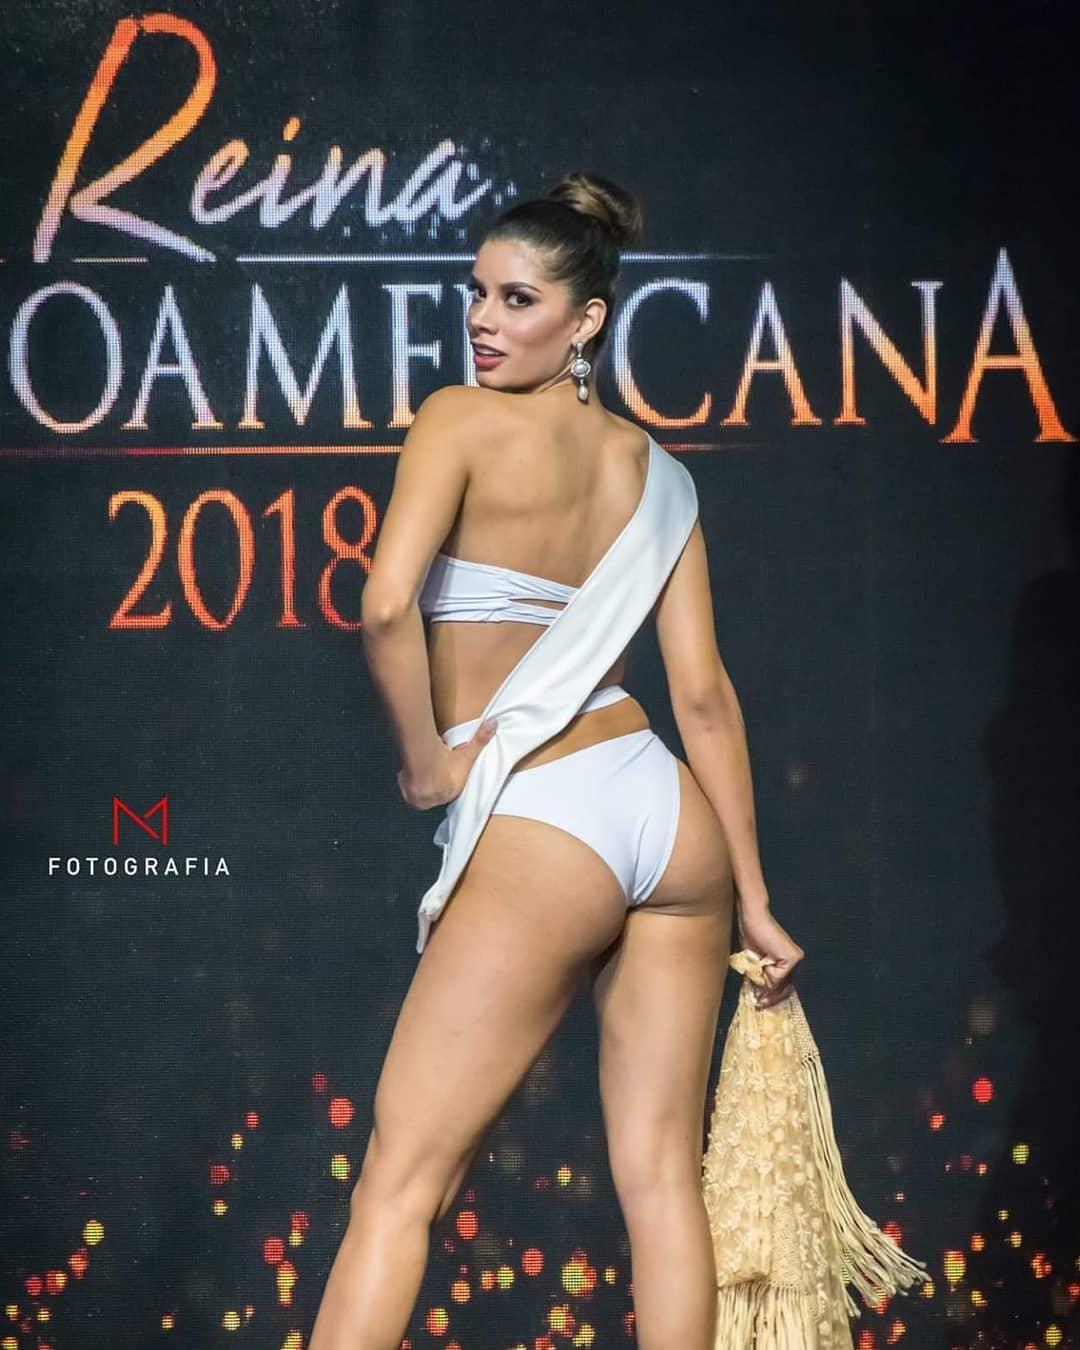 aranza molina, 1 finalista de reyna hispanoamericana 2018. - Página 8 43536310